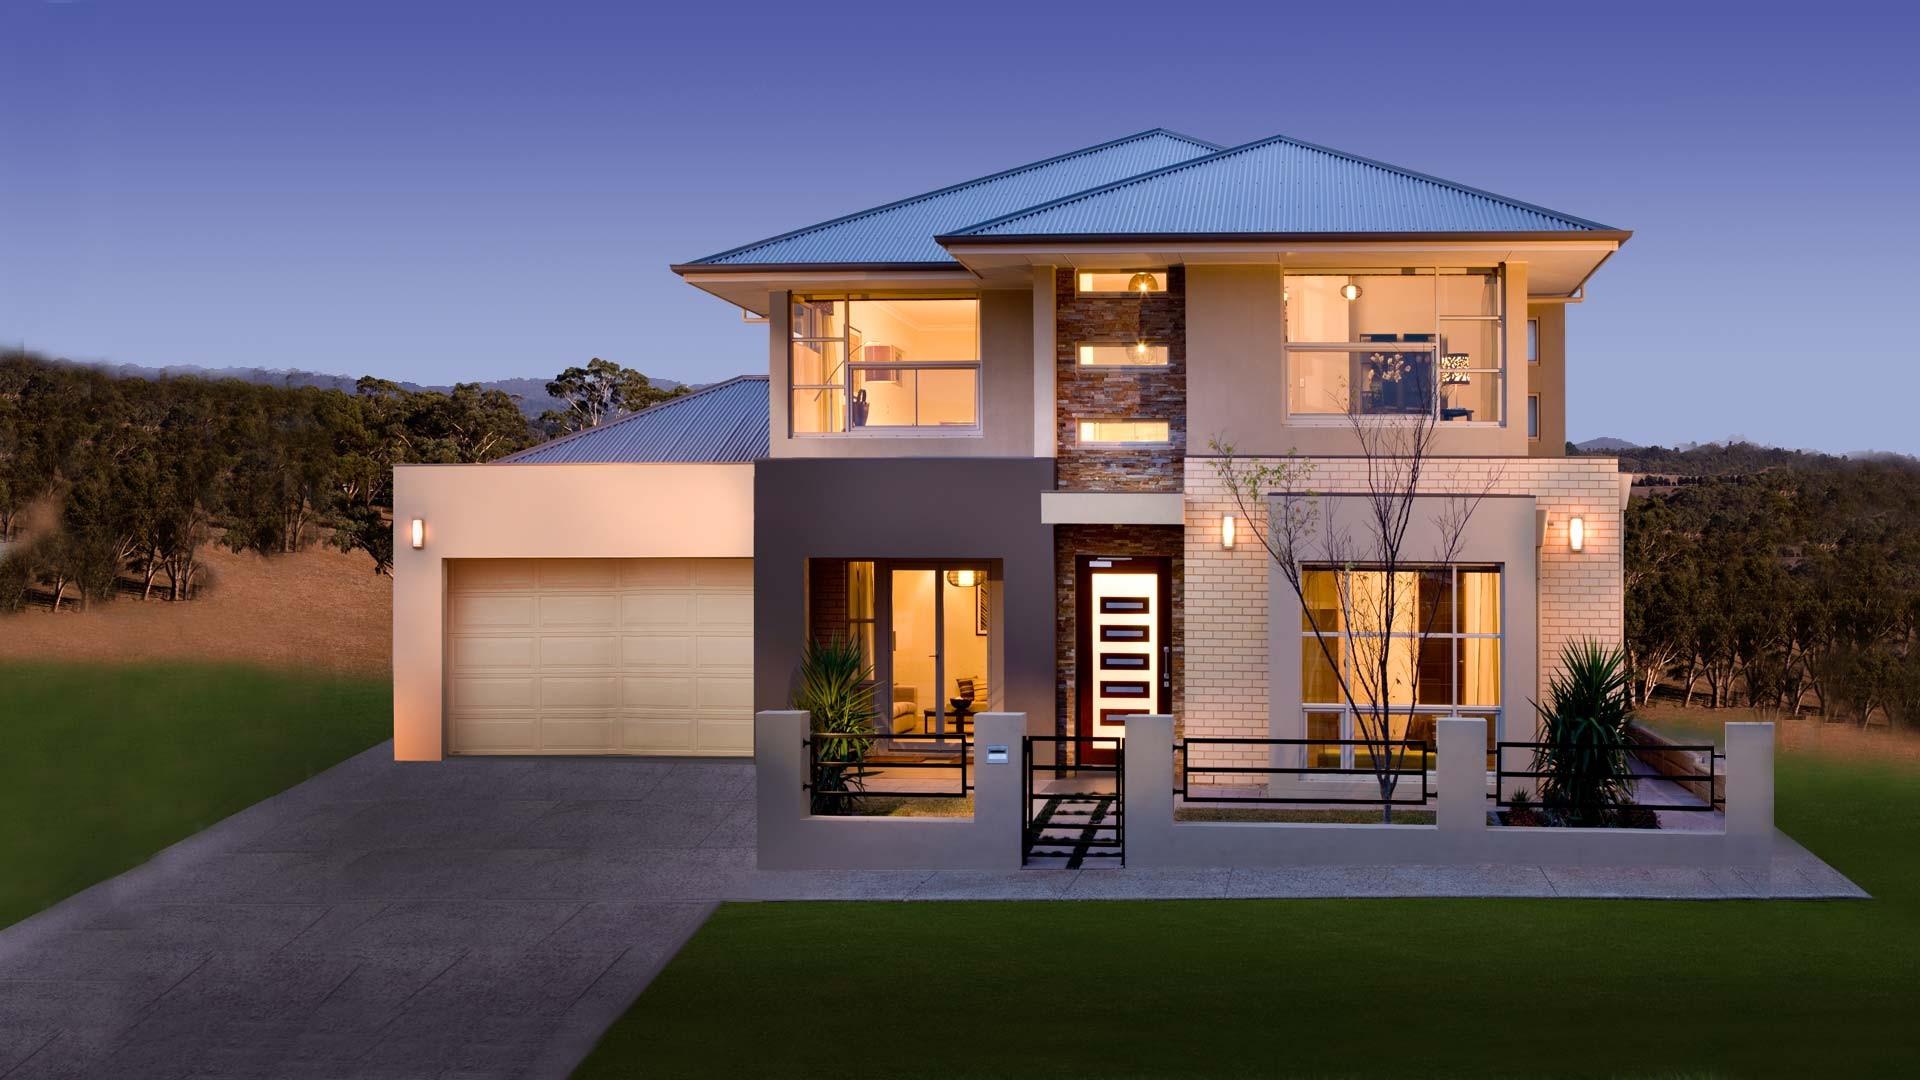 Sterling homes home builder adelaide home designs for Home designs adelaide